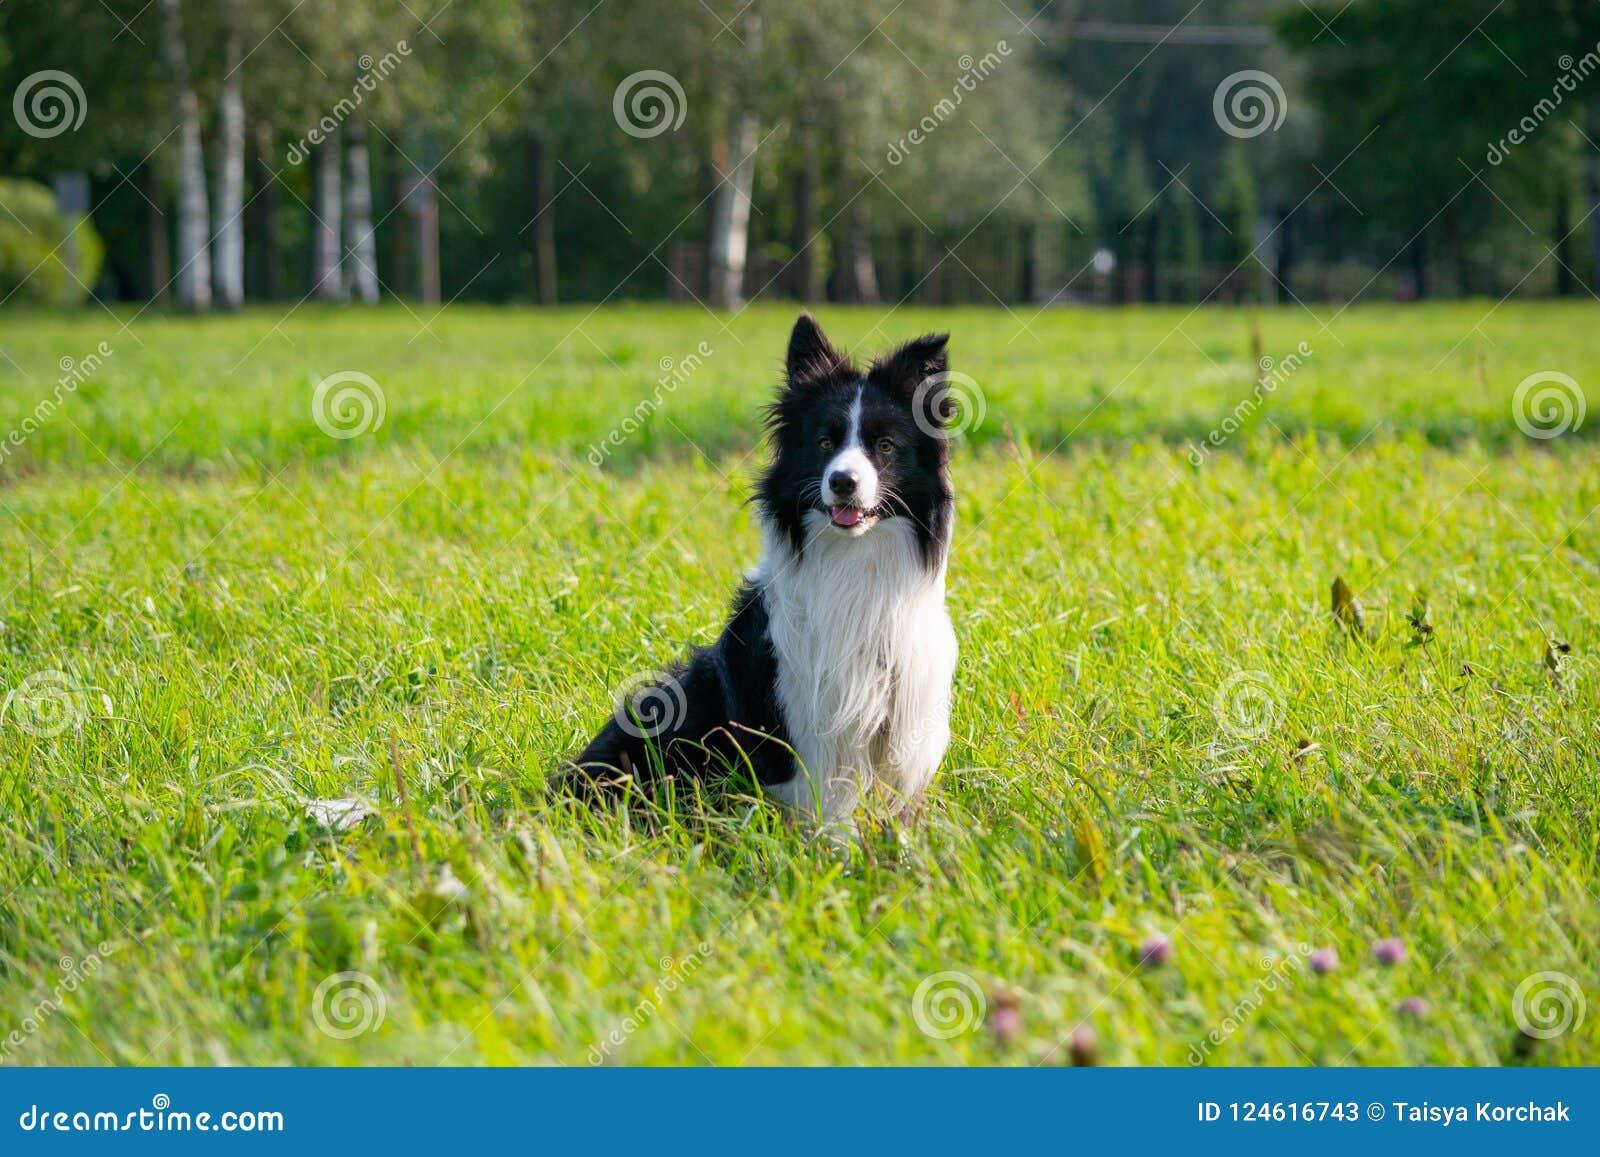 Jonge energieke hond op een gang Border collie